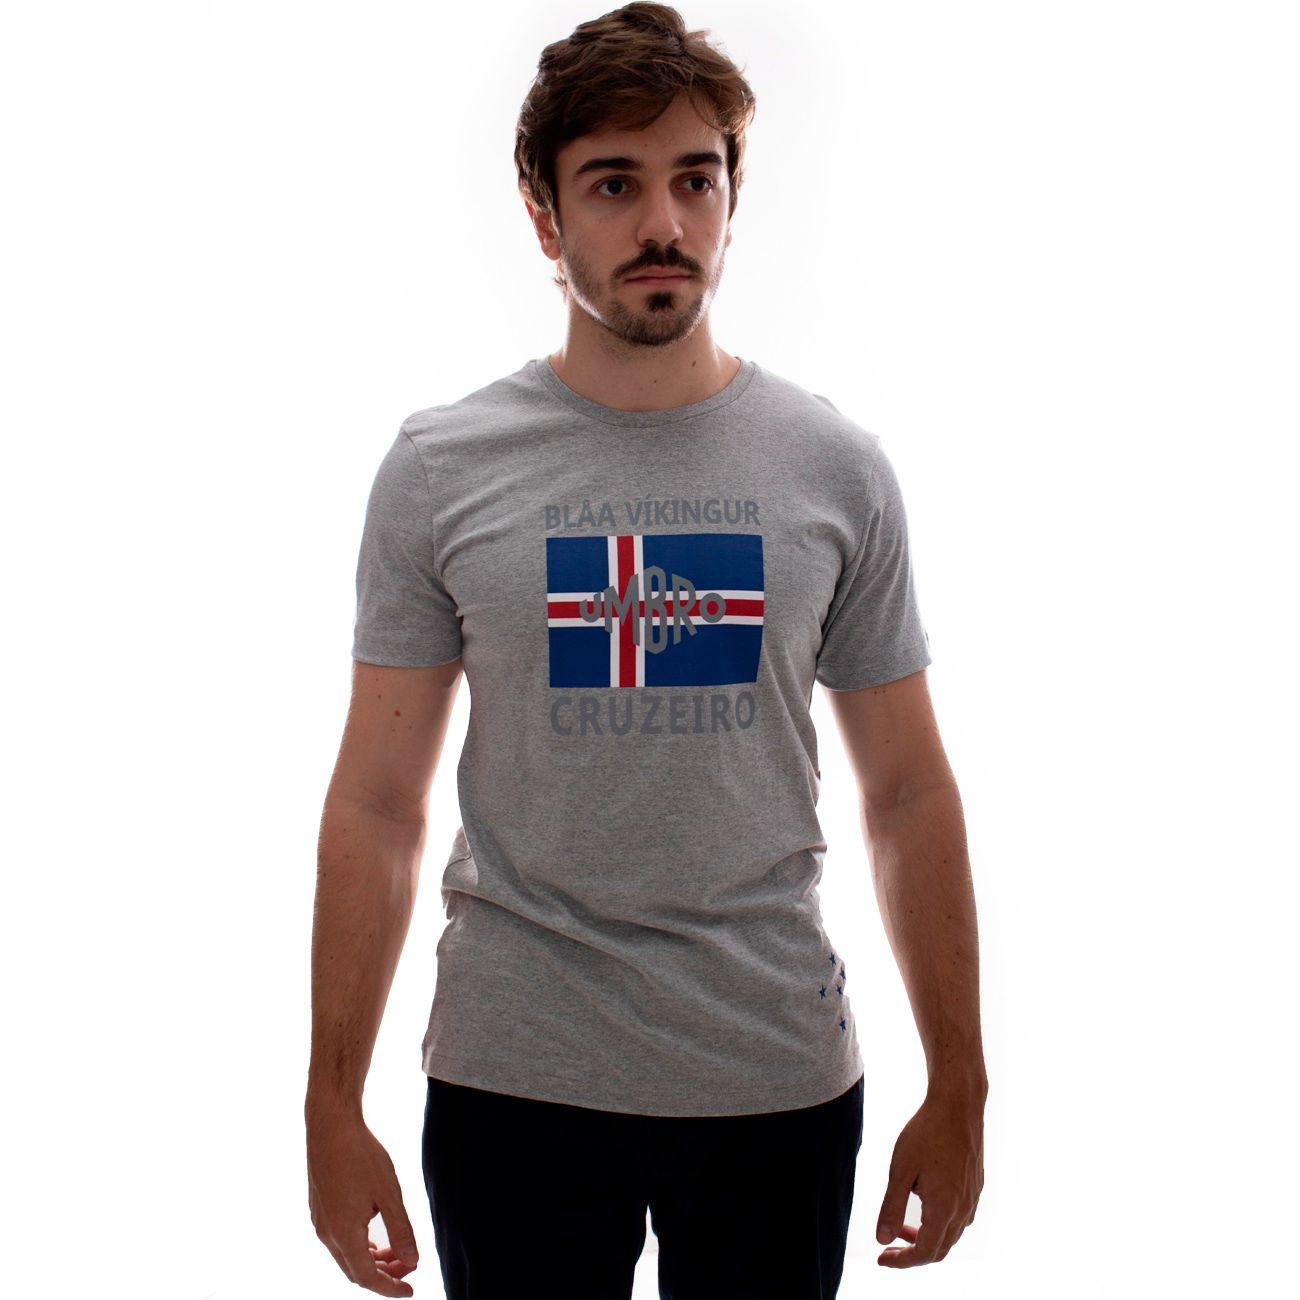 Camiseta Umbro Cruzeiro Blar Vikingur